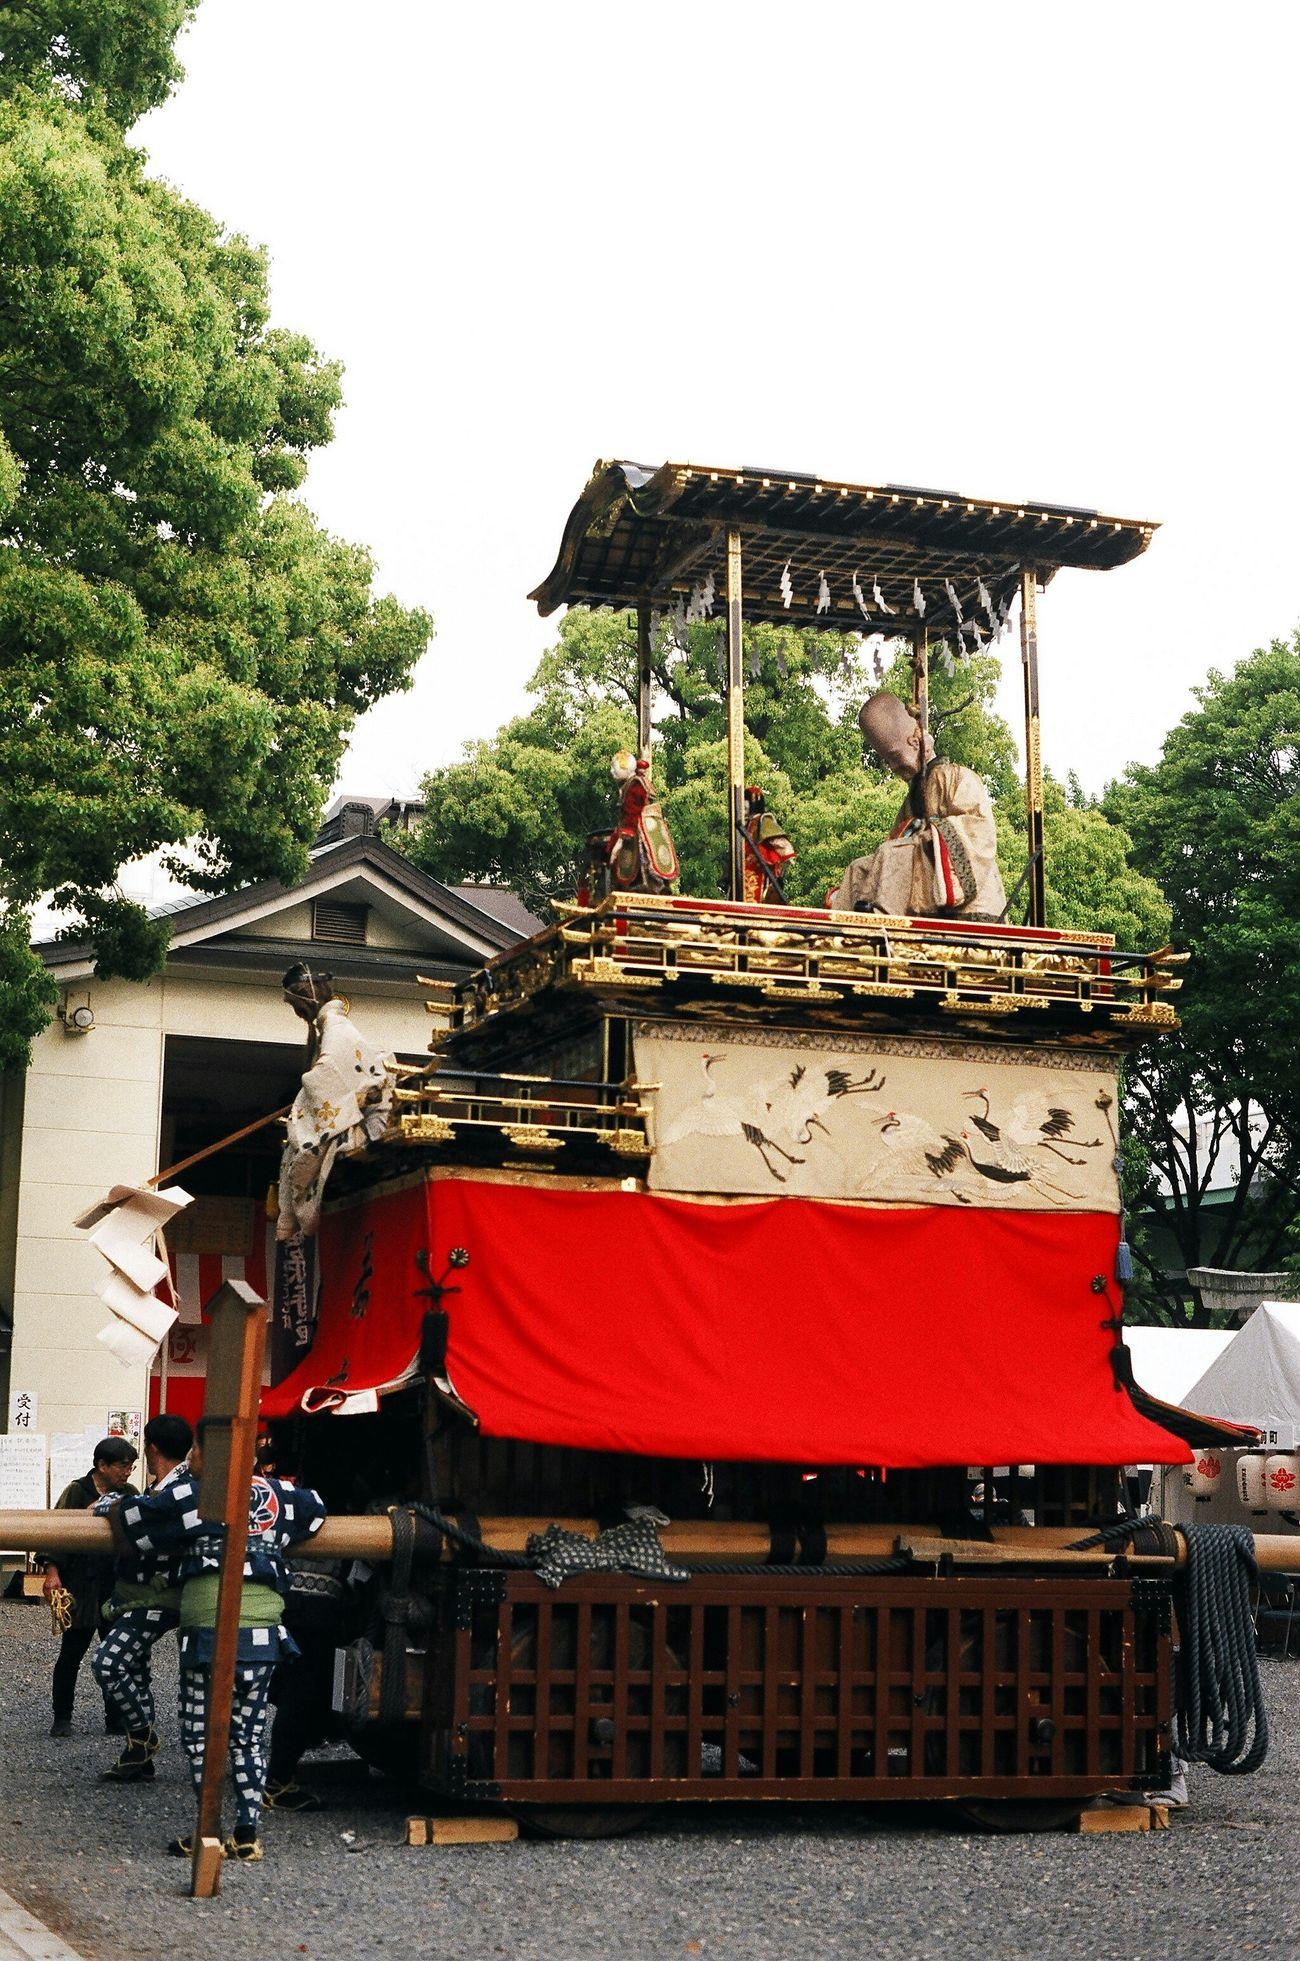 Nagoya Festival Hatimannsha 若宮祭 山車 Float Festival Car Japan 福禄寿車